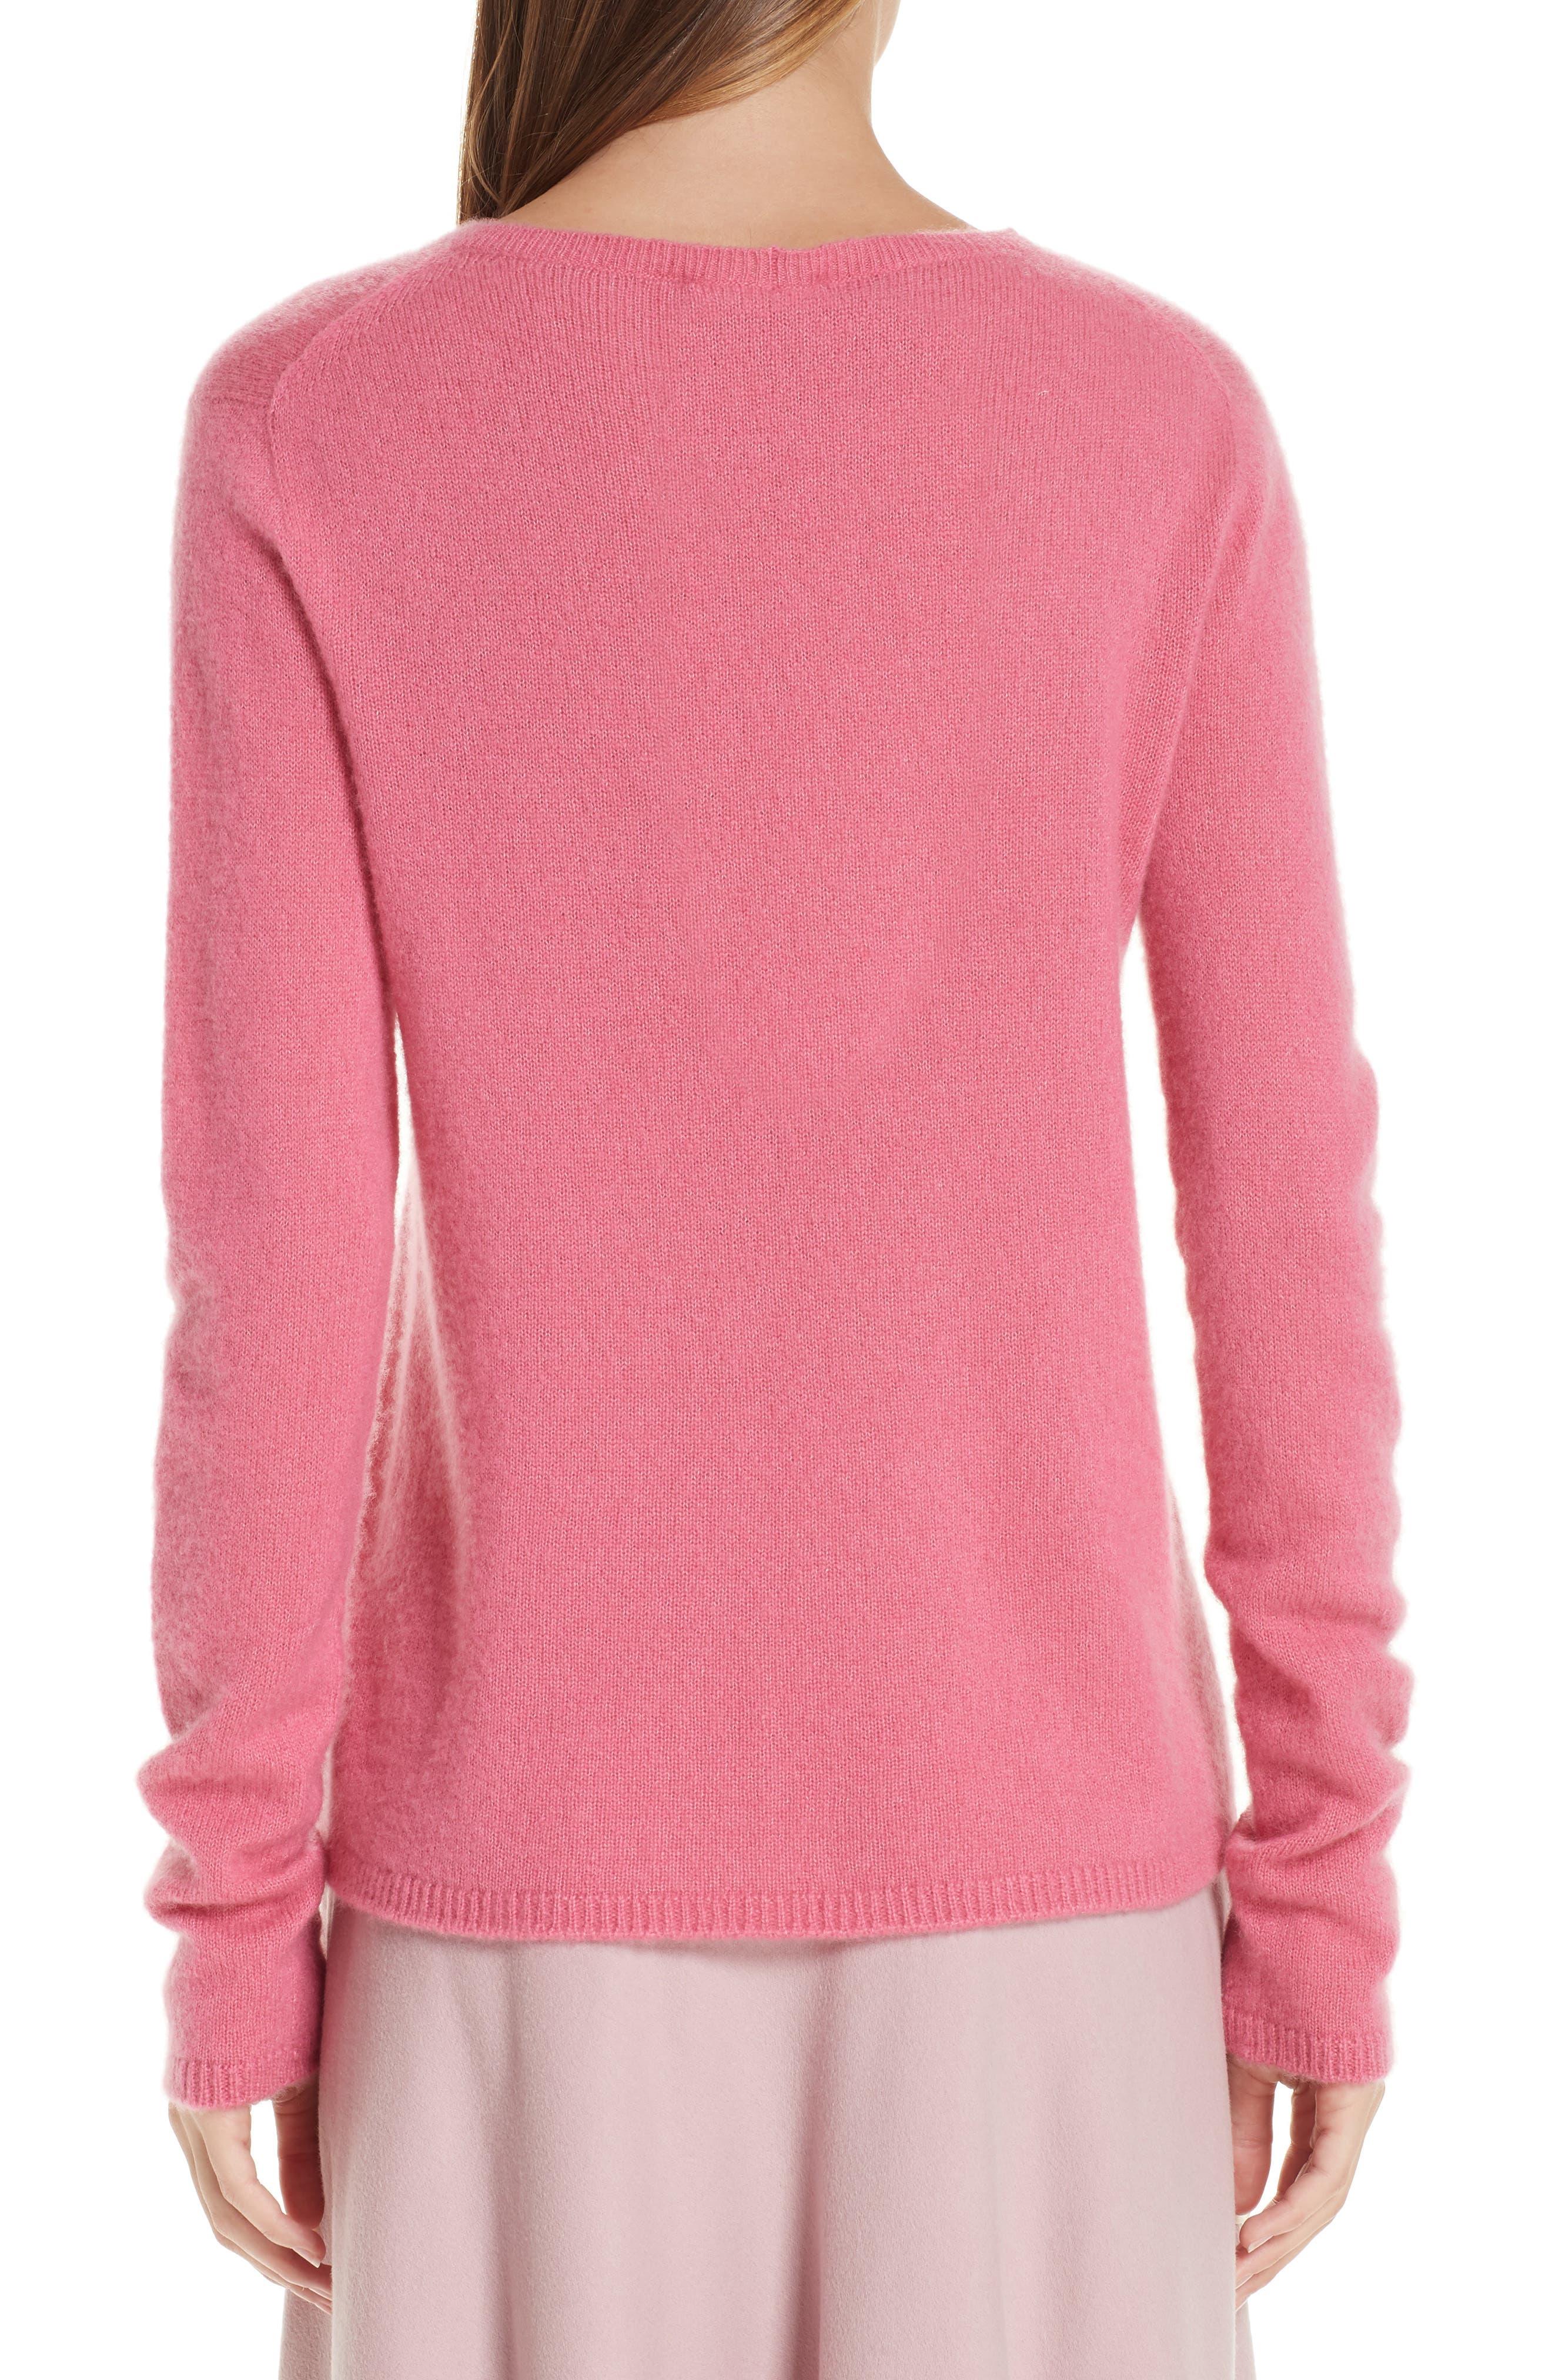 MAX MARA, Stelvio Cashmere & Silk Sweater, Alternate thumbnail 2, color, 672